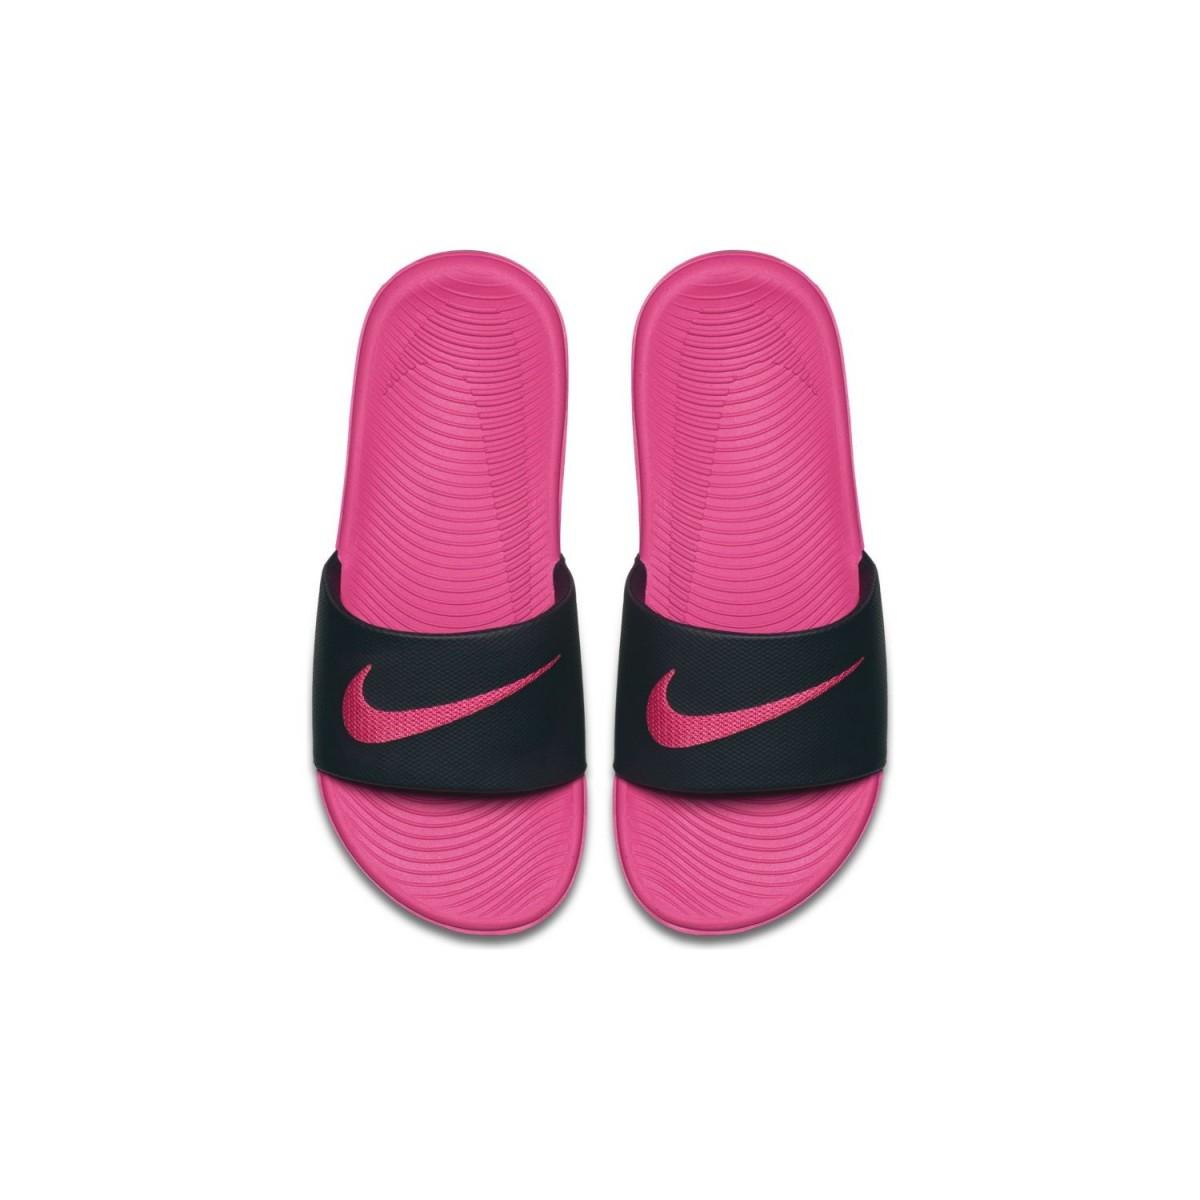 acc155b58 CHANCLAS NIKE: Nike Kawa Slide GS Negras| Chanclas Nike Mujer Negras ...